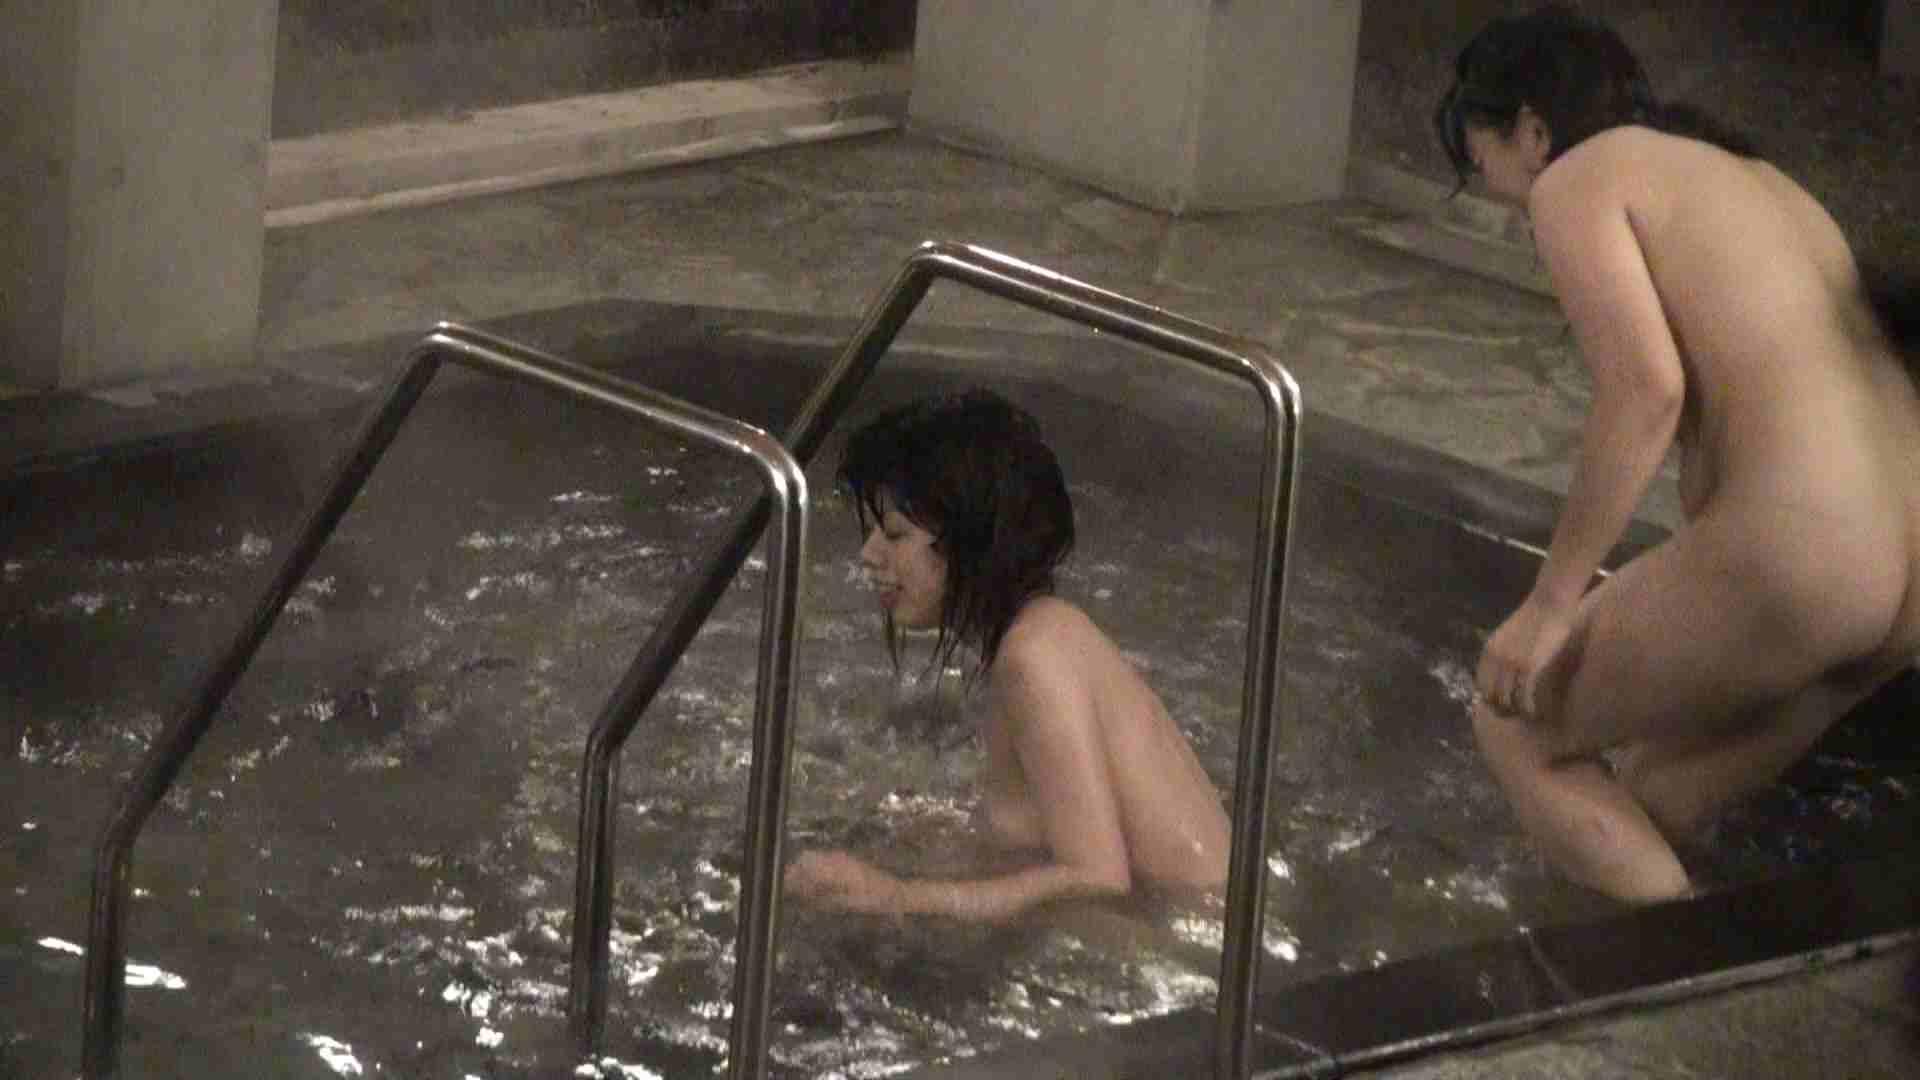 Aquaな露天風呂Vol.405 女体盗撮 盗撮オマンコ無修正動画無料 86連発 32